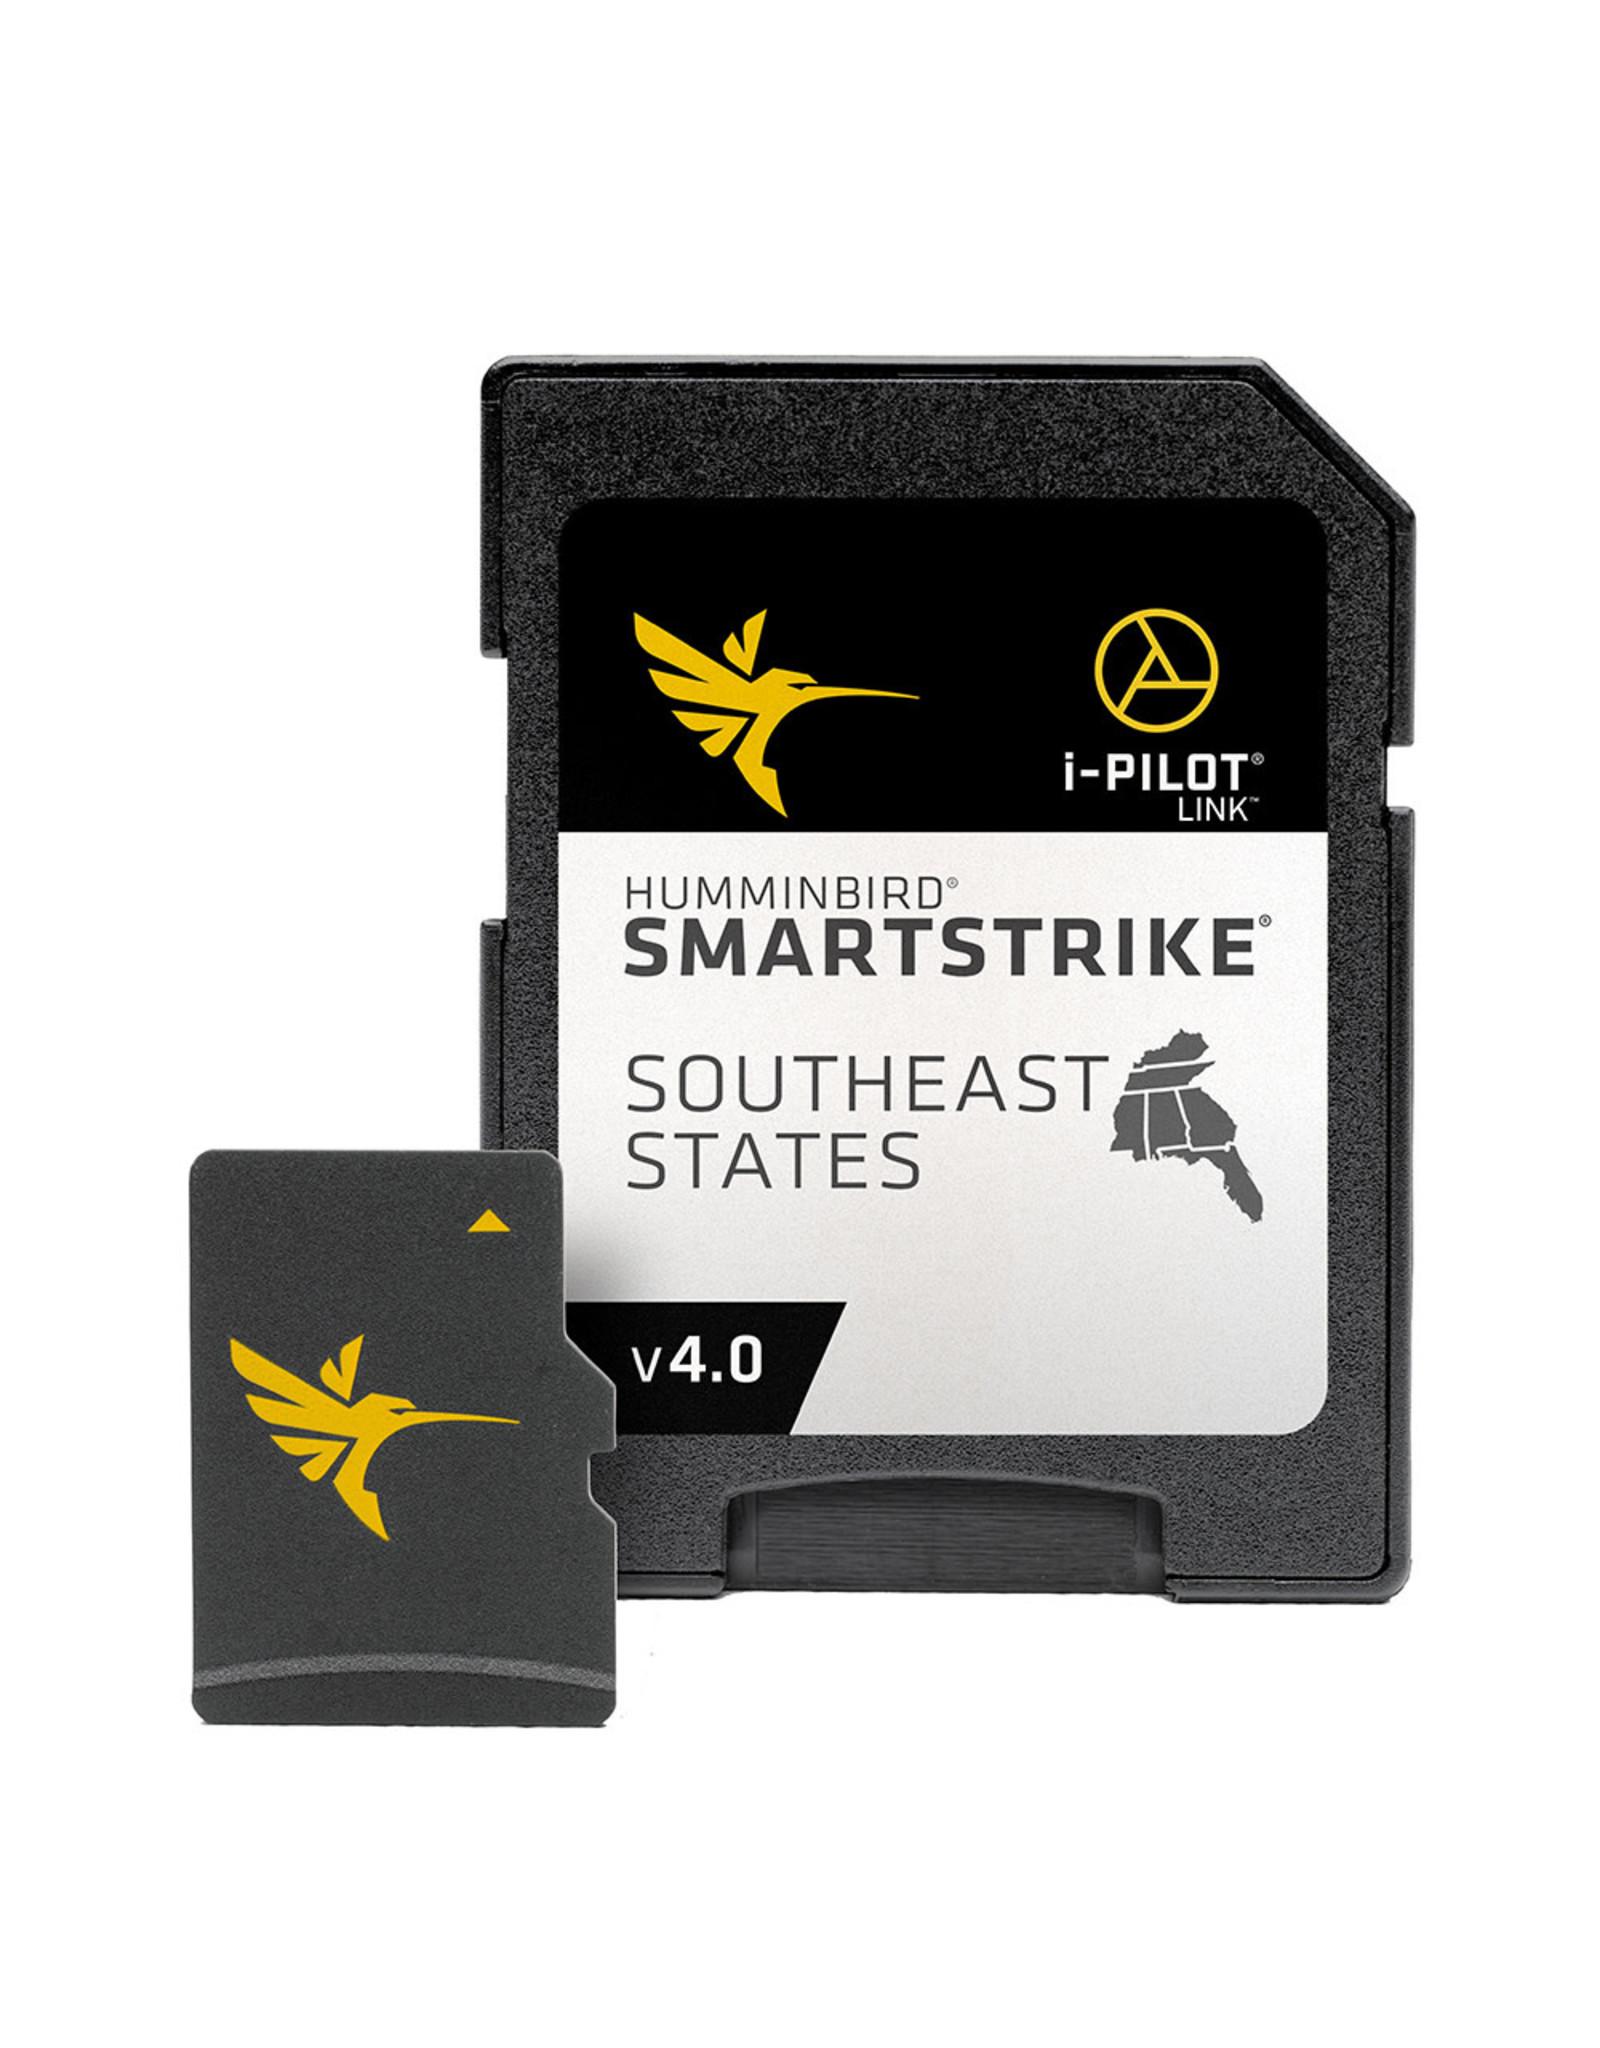 Humminbird SmartStrike® Southeast States - Version 4